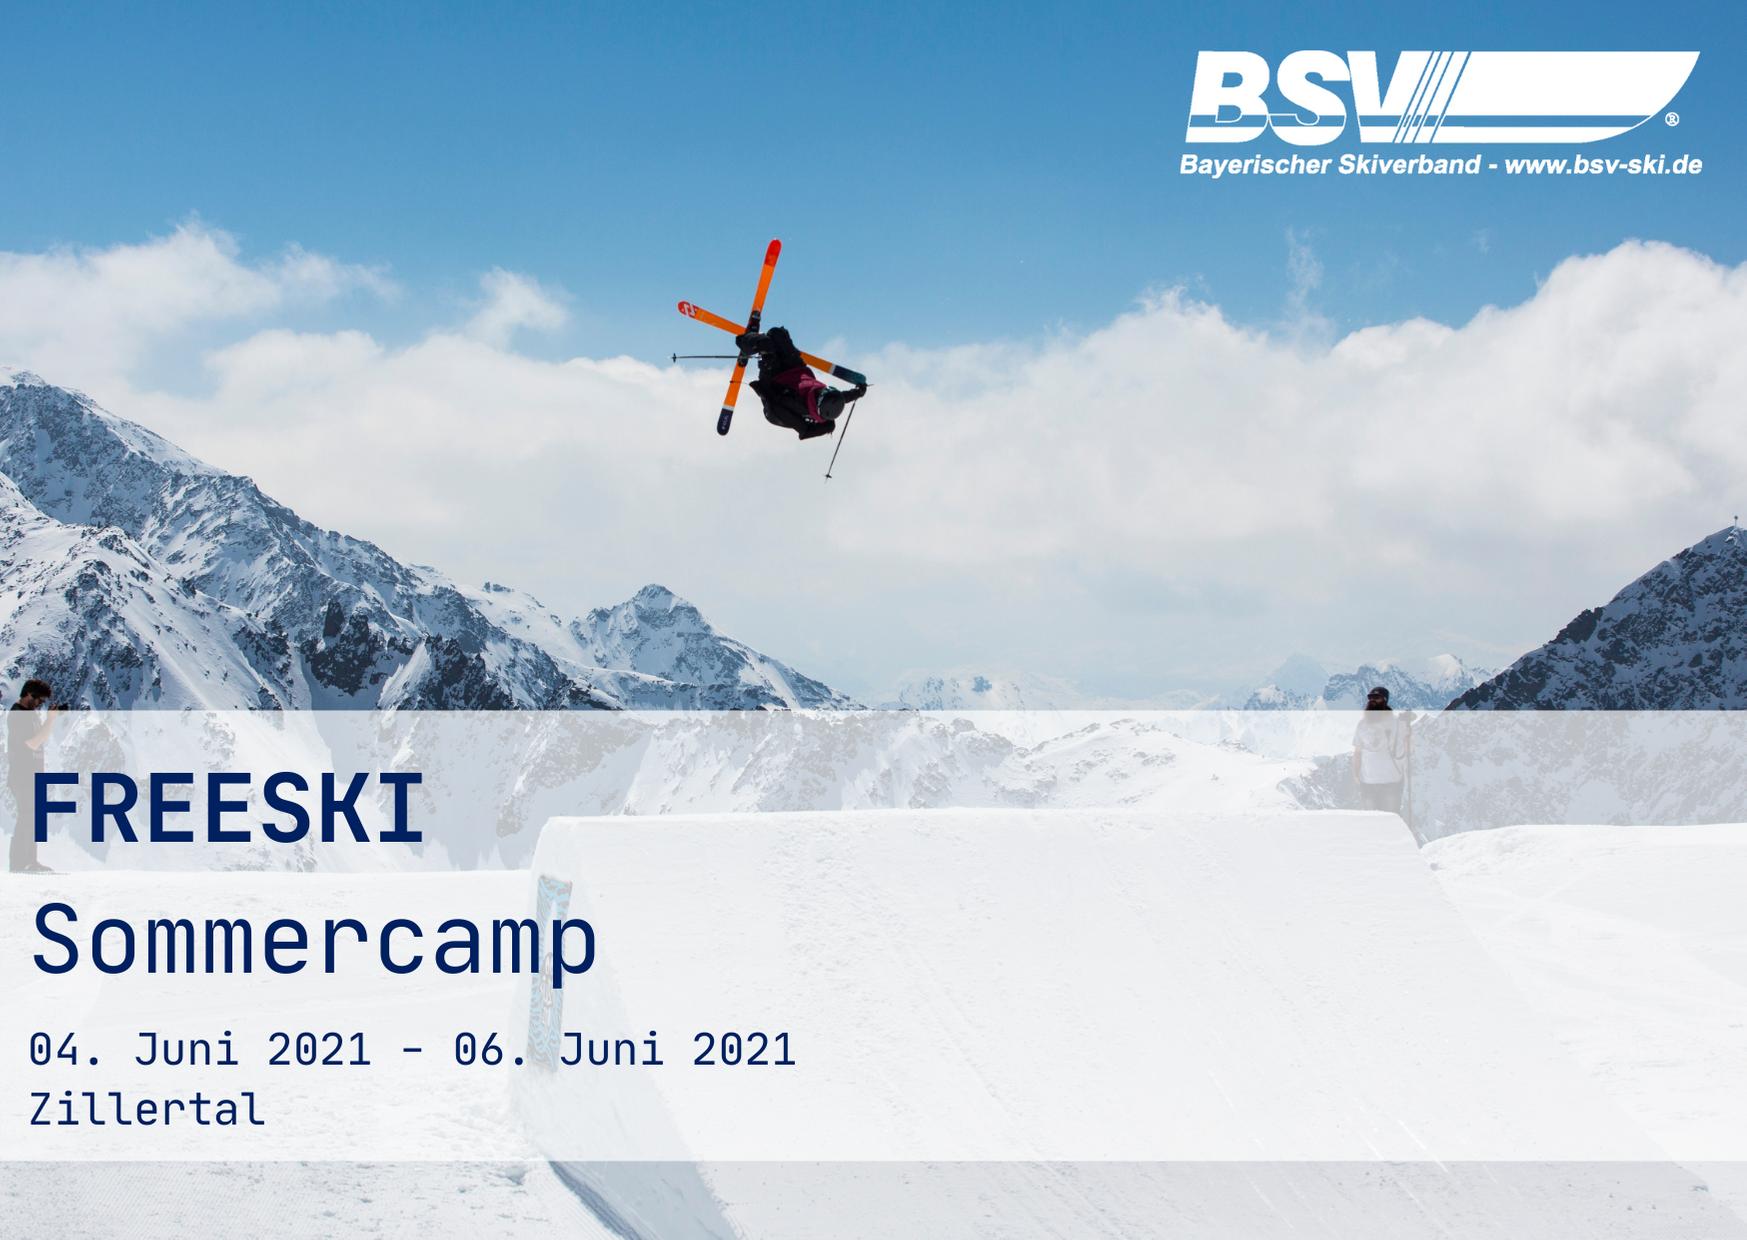 FREESKI Sommercamp